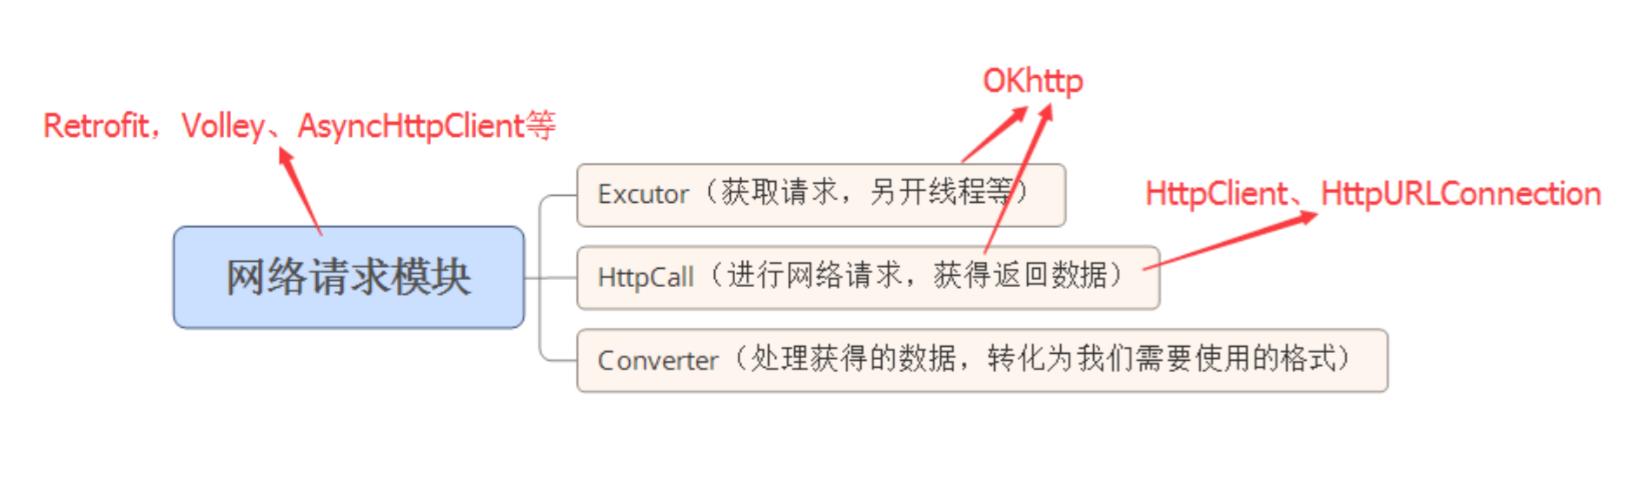 Android】OkHttp源码分析- Mlib - CSDN博客